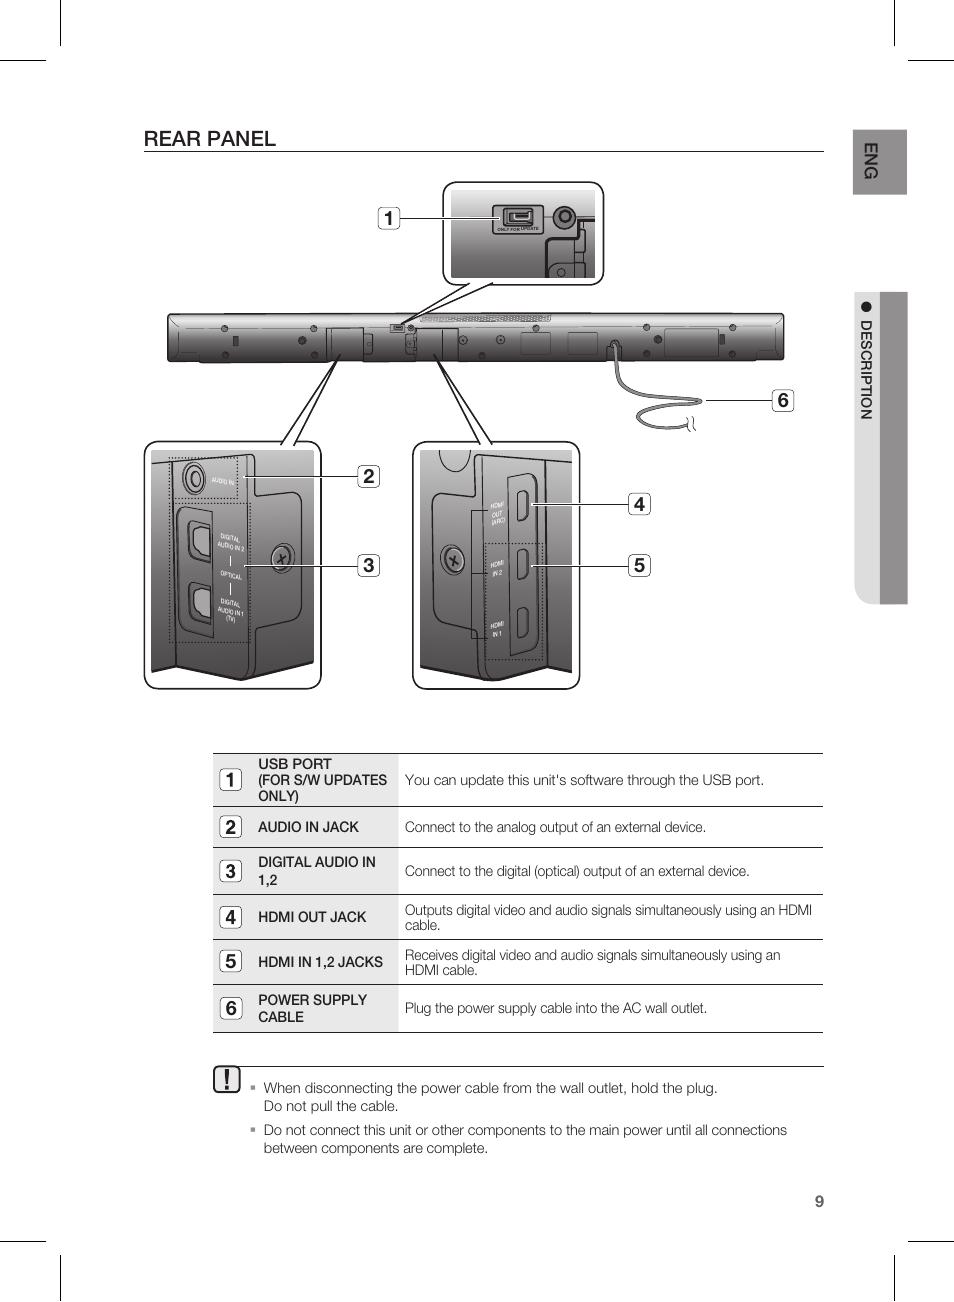 rear panel samsung hw d550 user manual page 9 25 original mode rh manualsdir com Samsung Sound Bar for TV HW-D550 Frequency Response